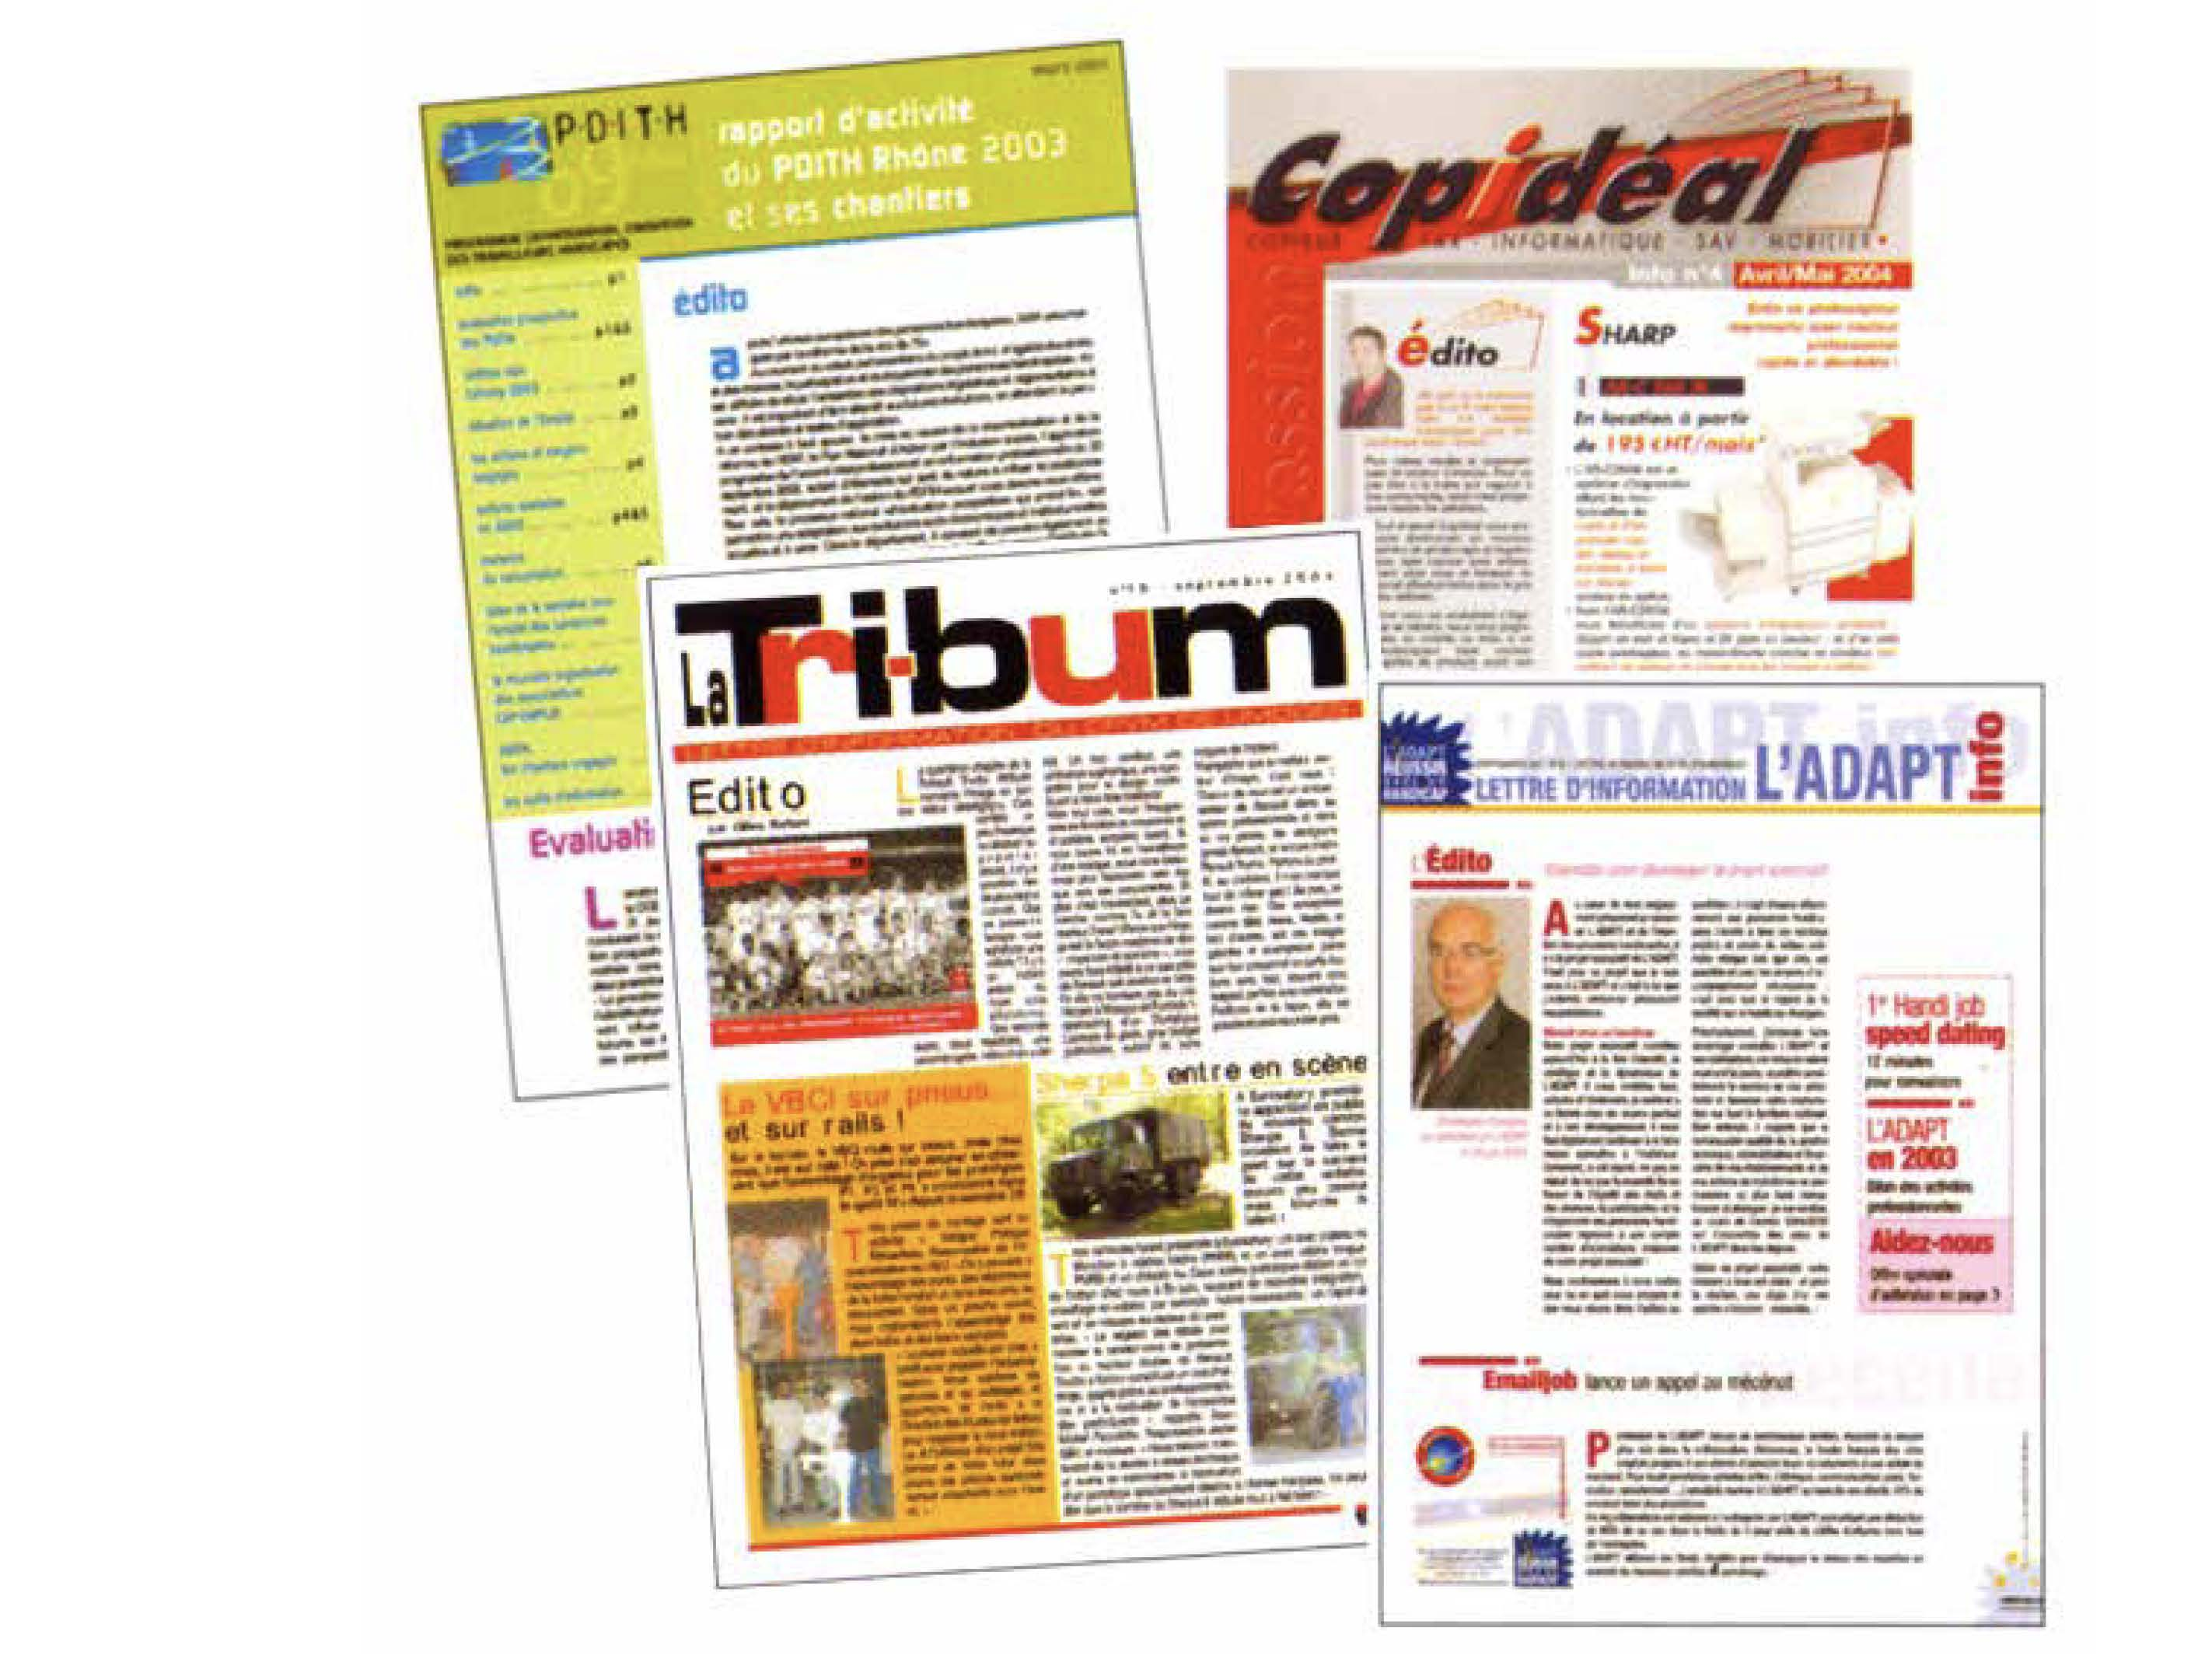 Magazine Lettres_Lettres internes